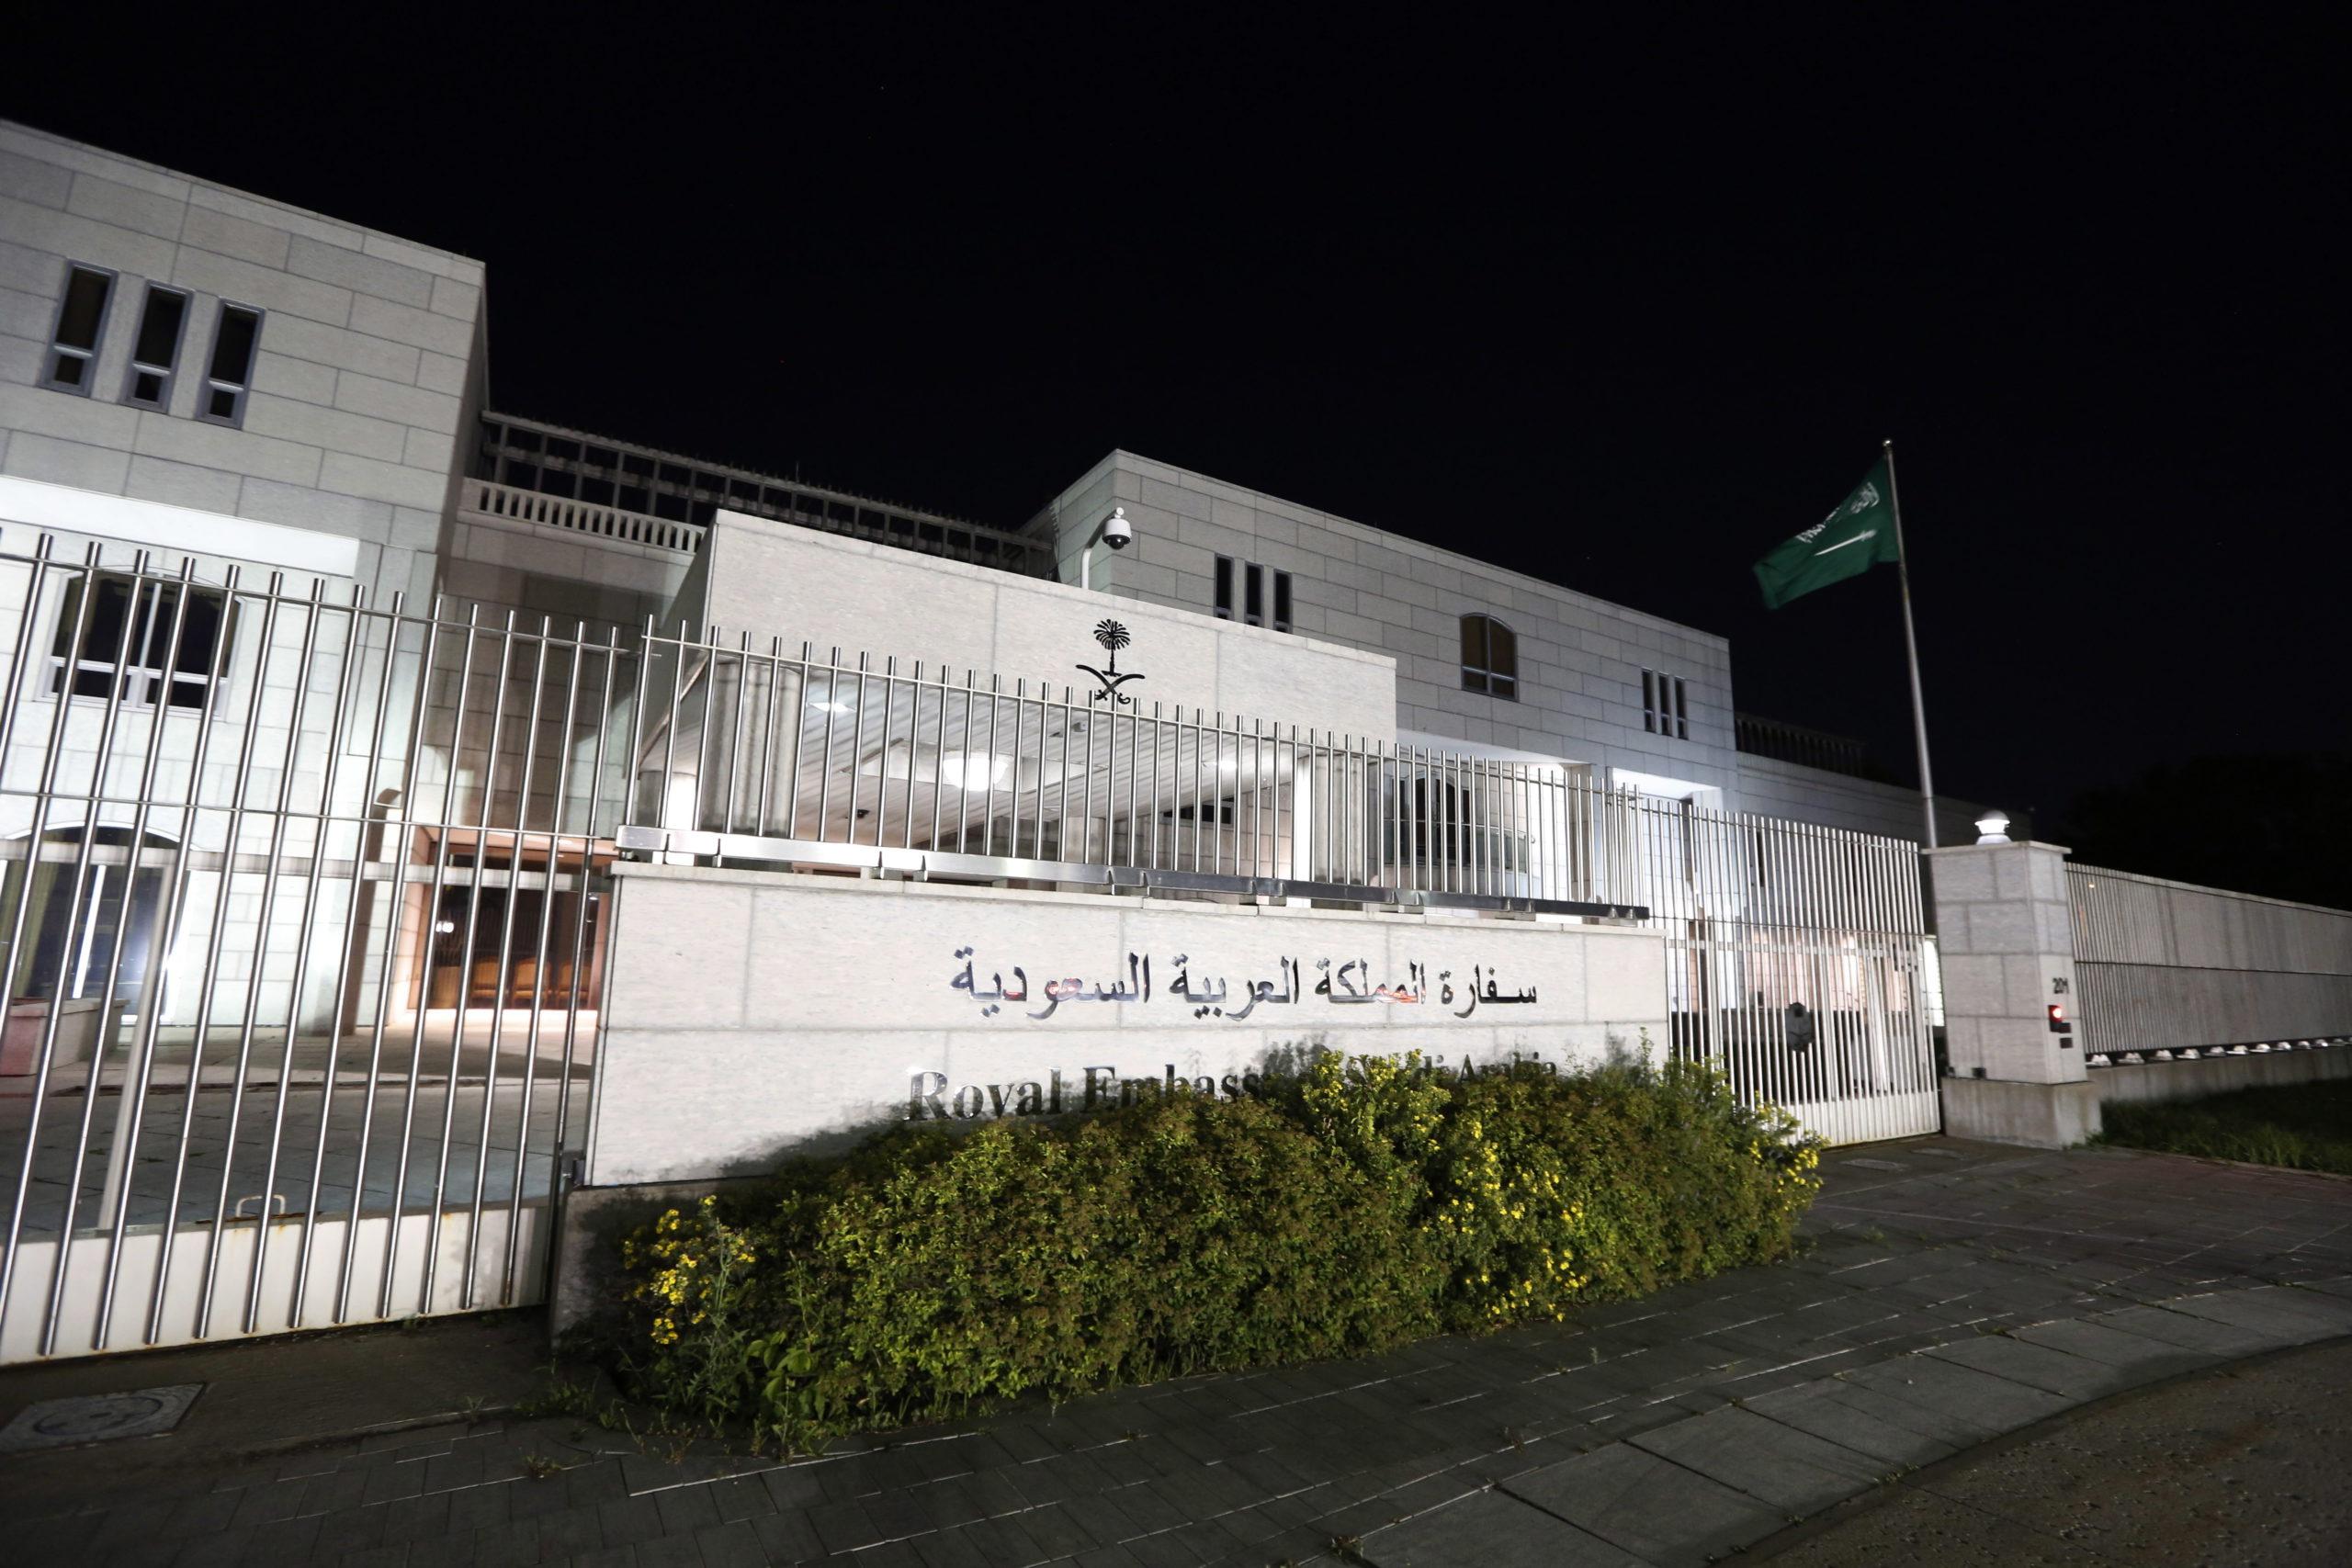 Photo of the Saudia Arabian Embassy in Ottawa, Canada